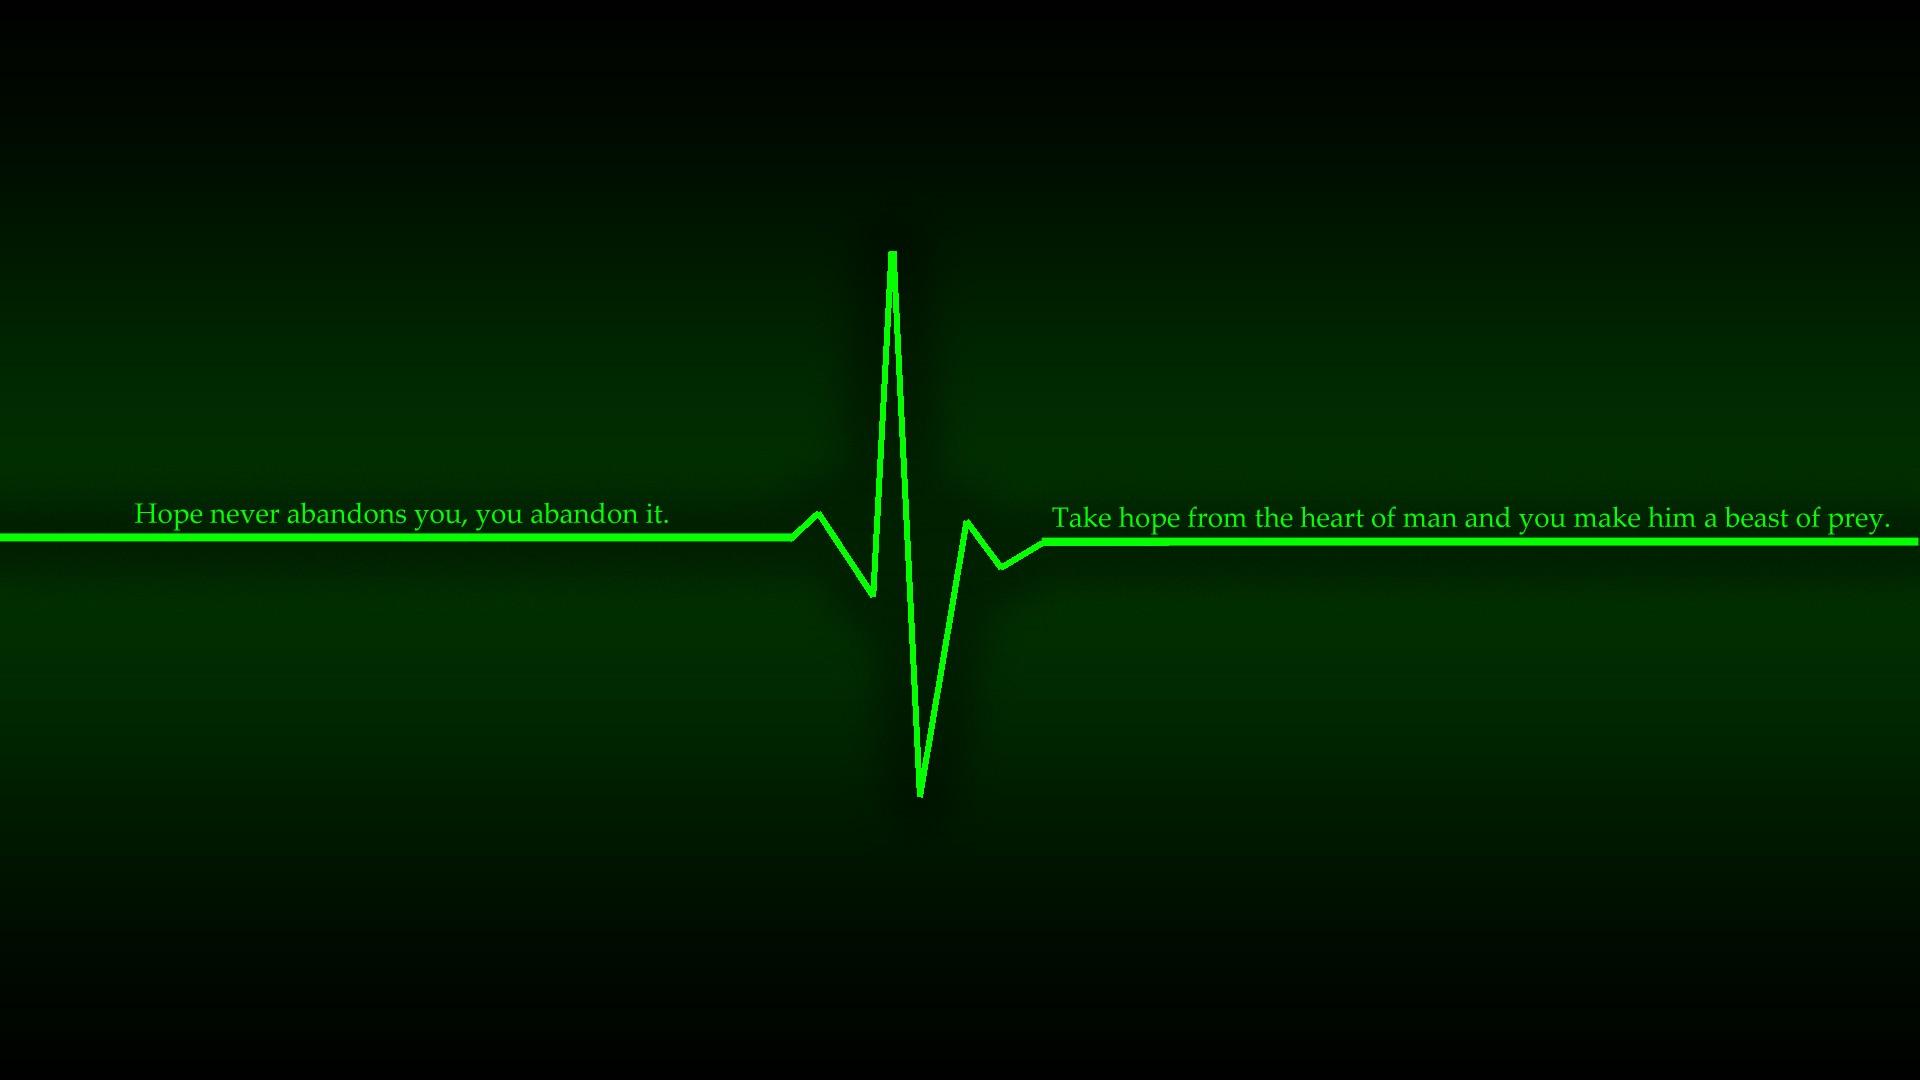 beats audio logo hd wallpaper